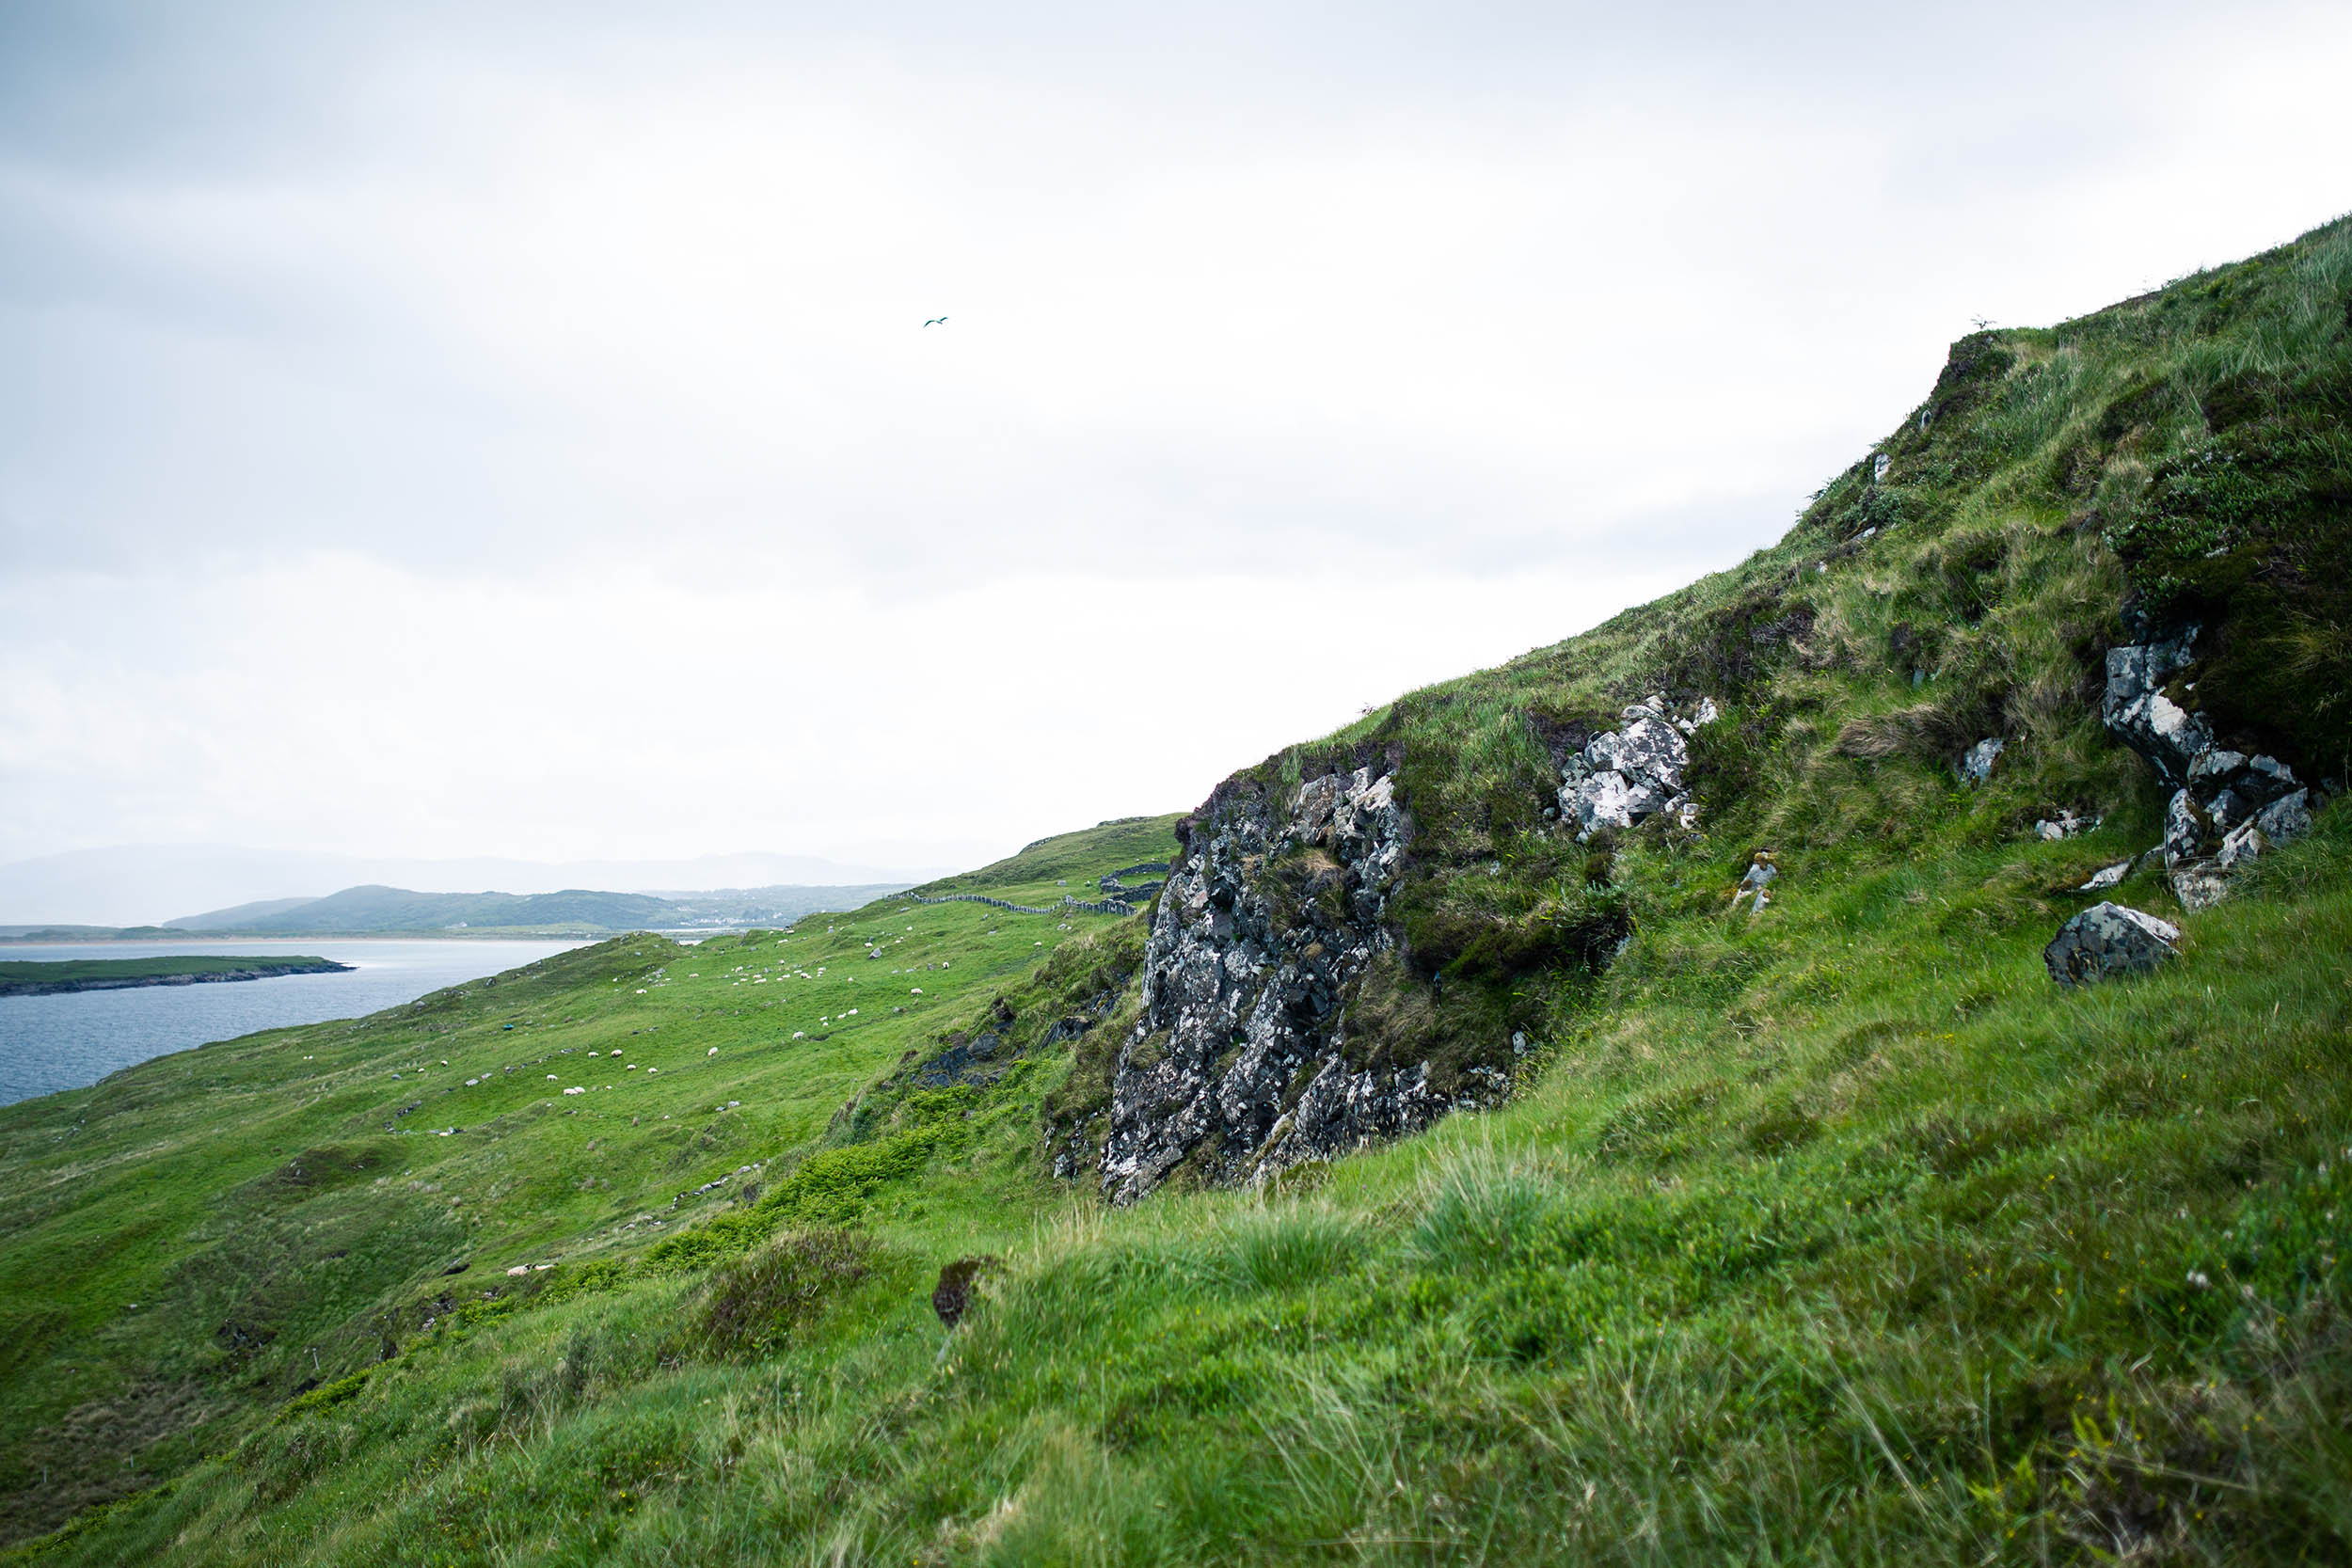 IRELAND_DONEGAL_PORTNOO_0088